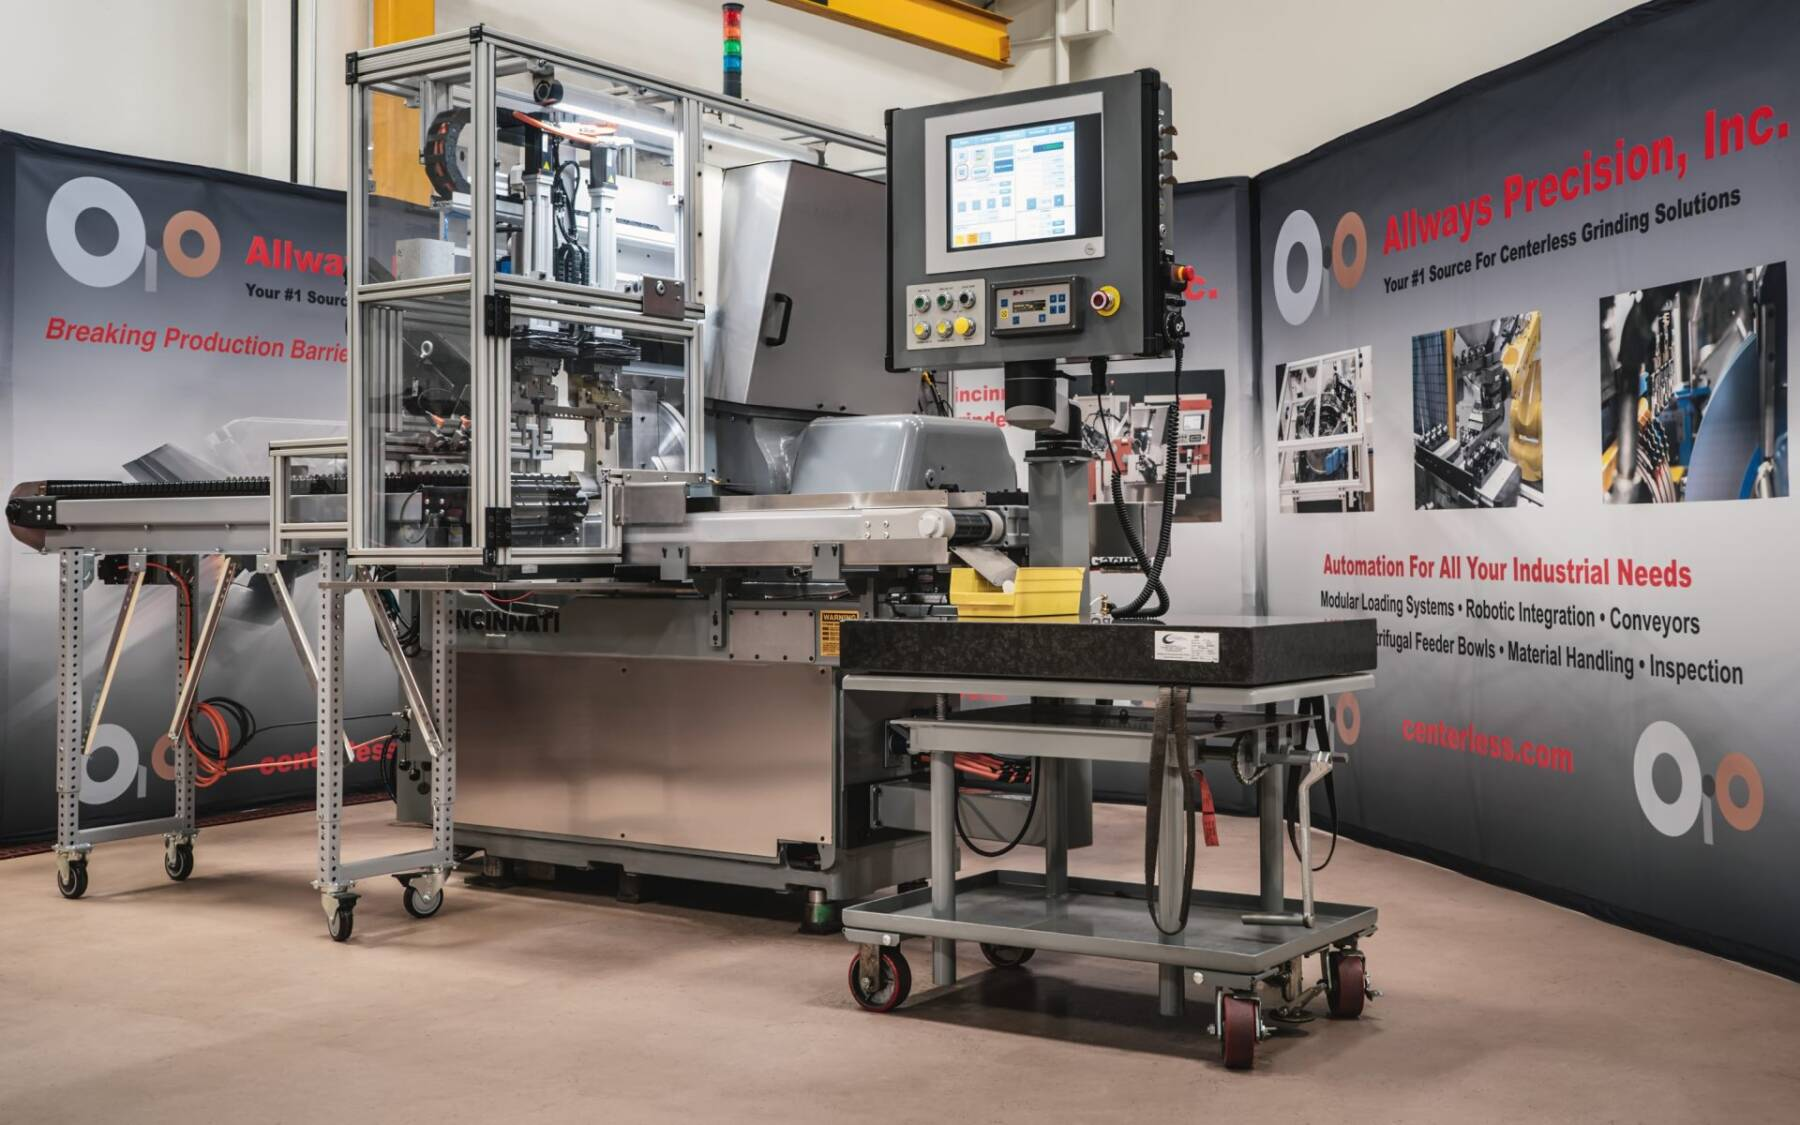 Automated Cincinnati #2OM CNC Centerless Grinder